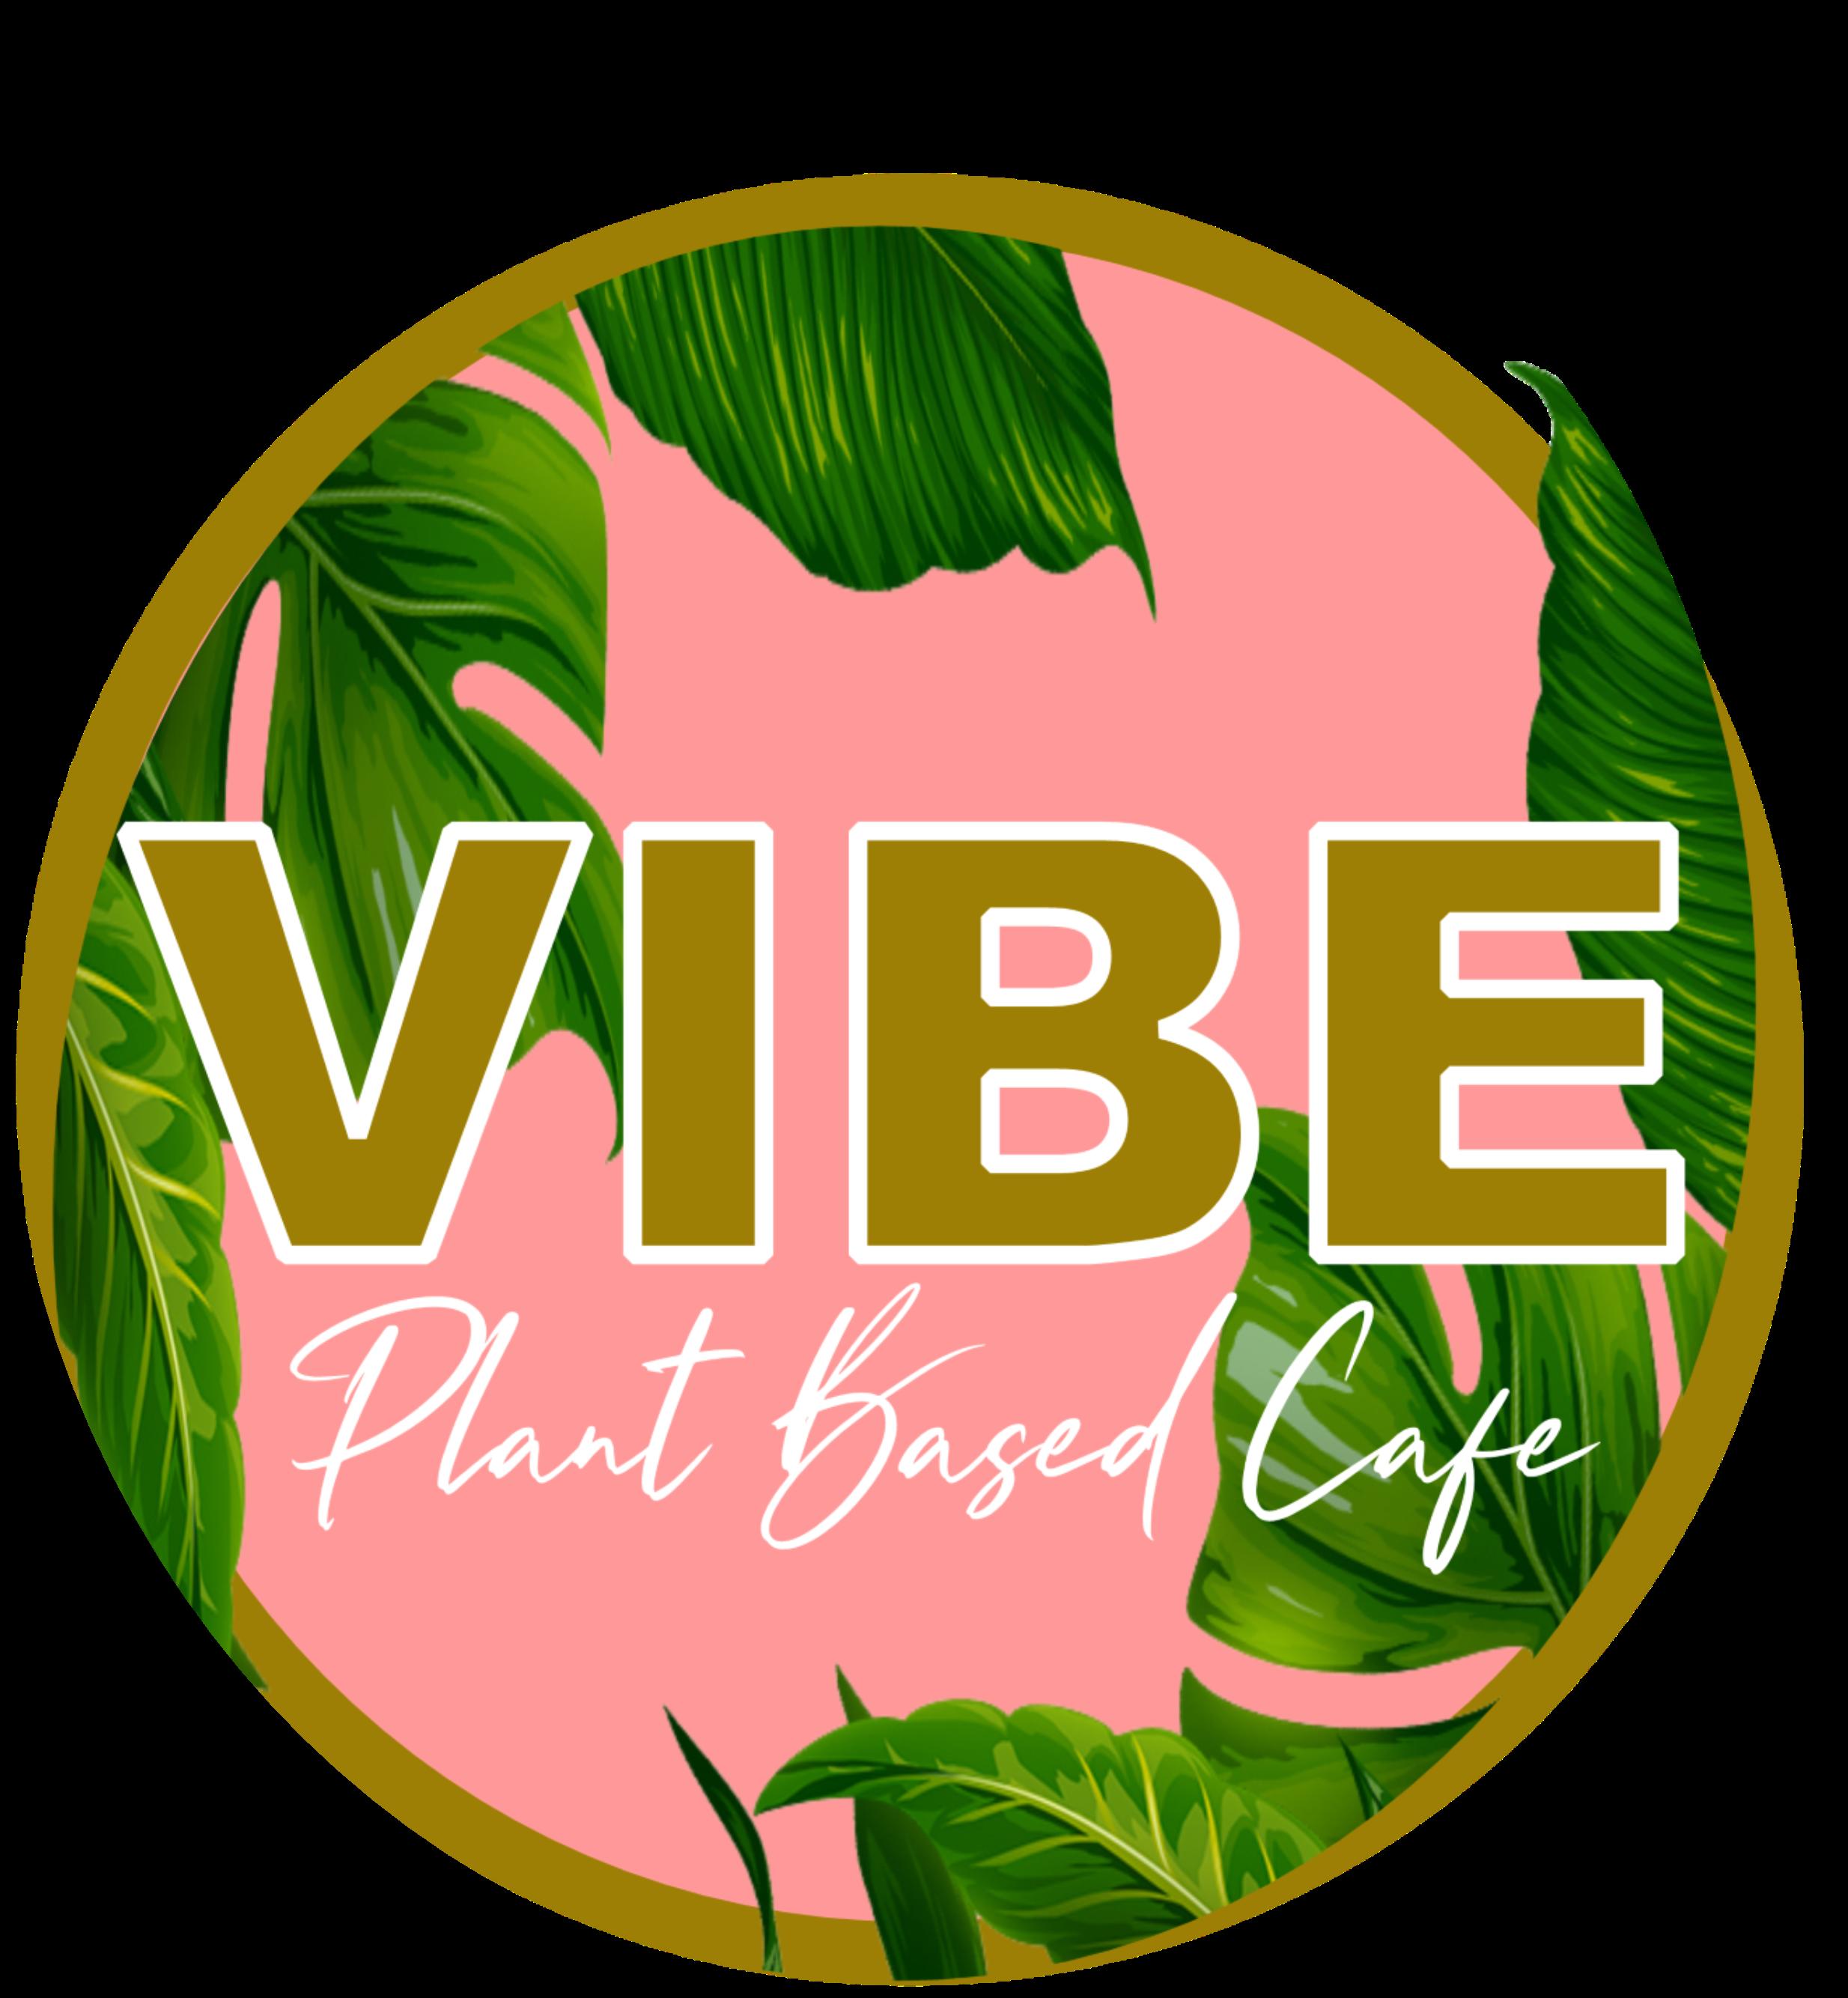 VIBE plantbased cafe